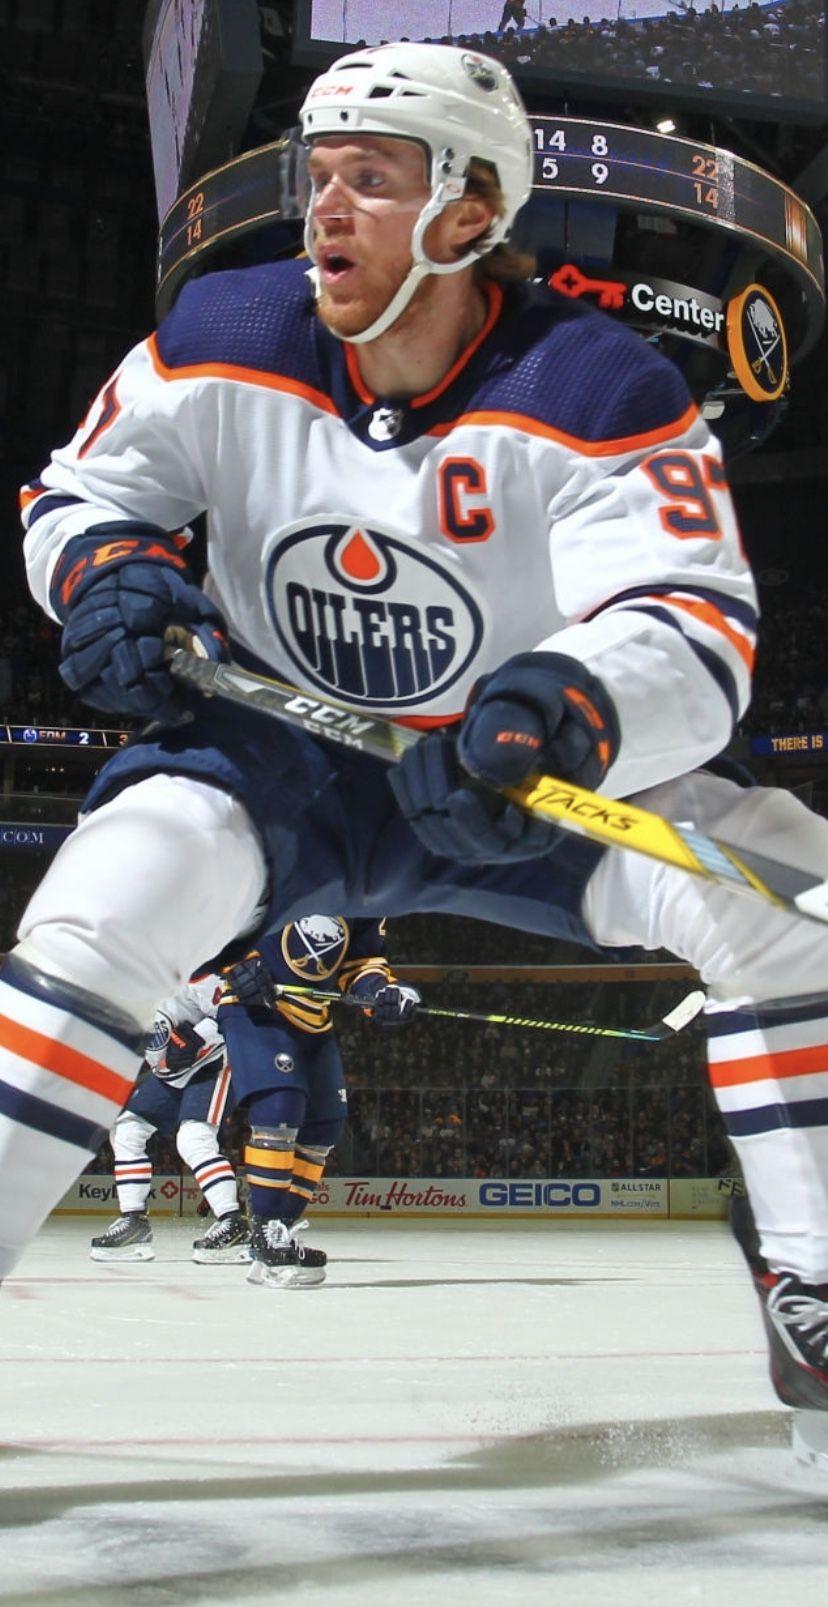 Pin By Annabella On Oilers In 2020 Sport Hockey Connor Mcdavid Mcdavid